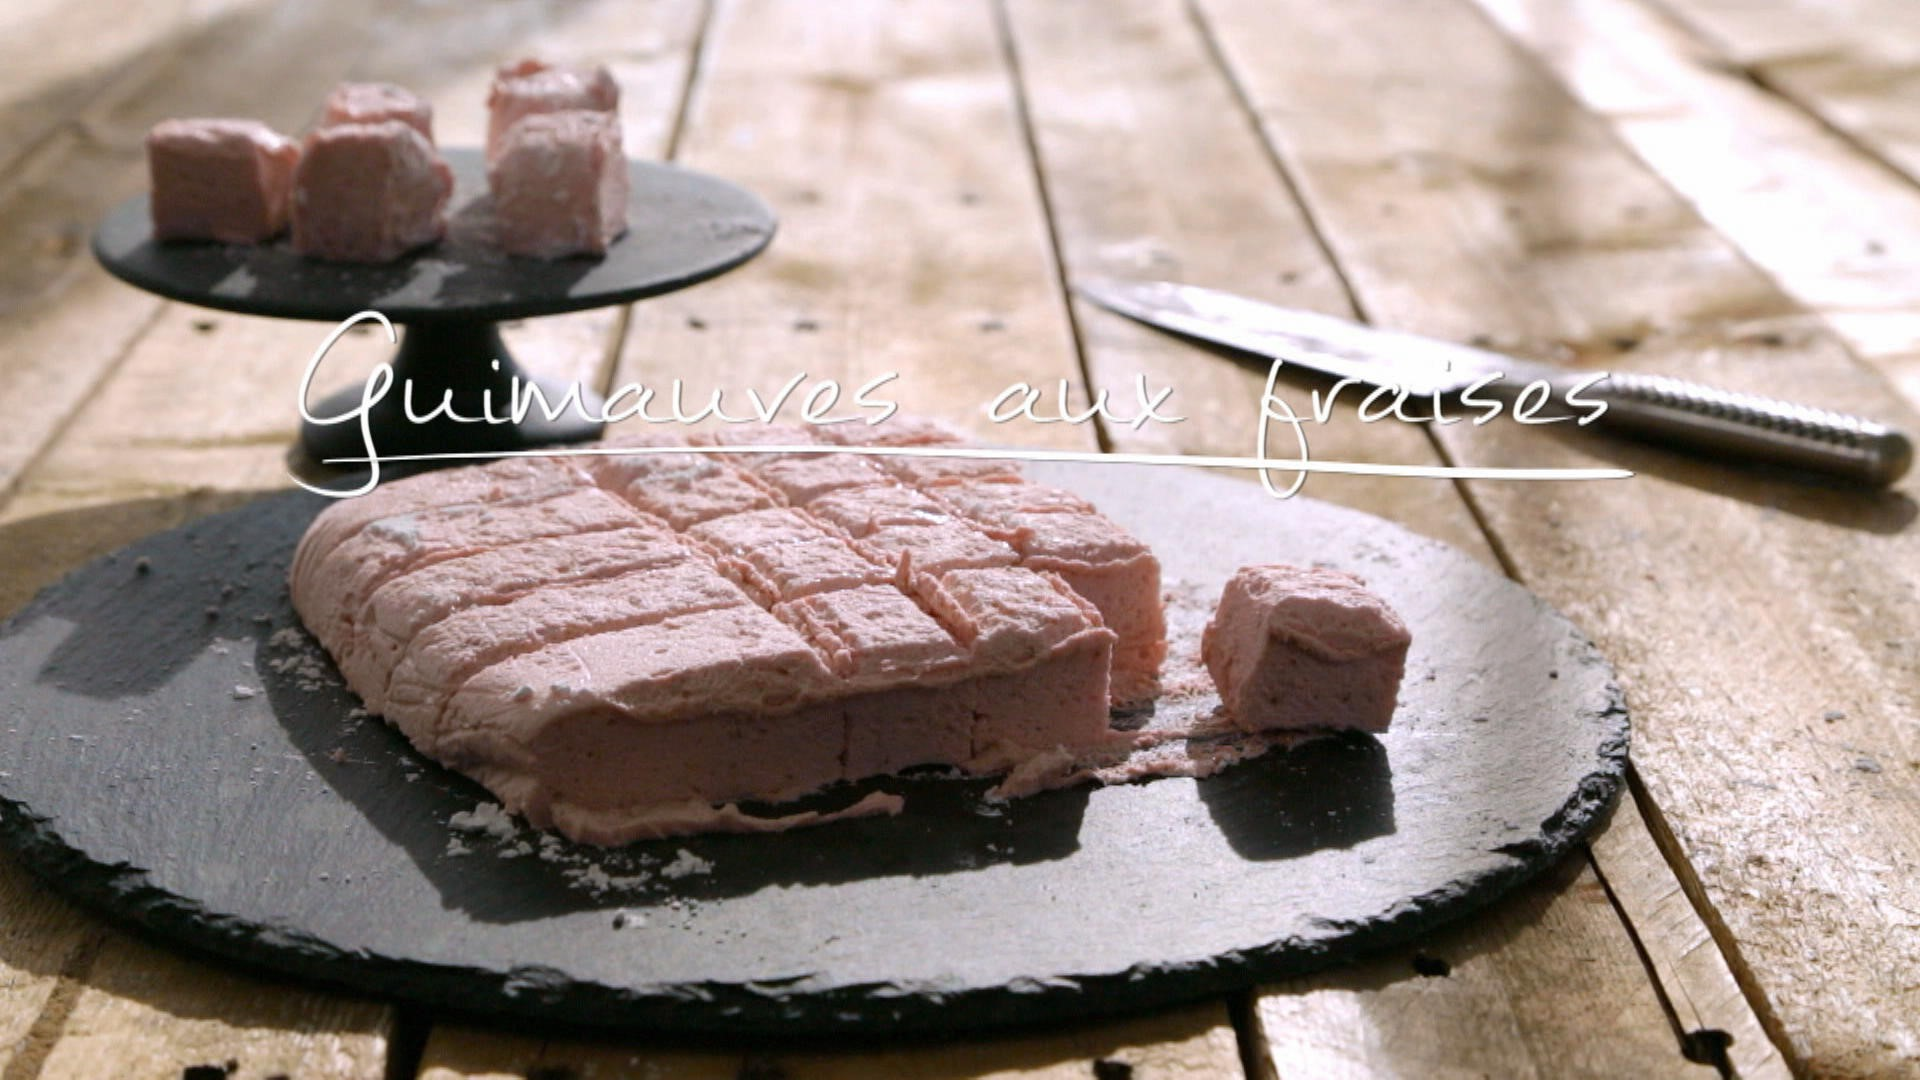 Nutella maison cuisine fut e avie home - Nutella maison cuisine futee ...